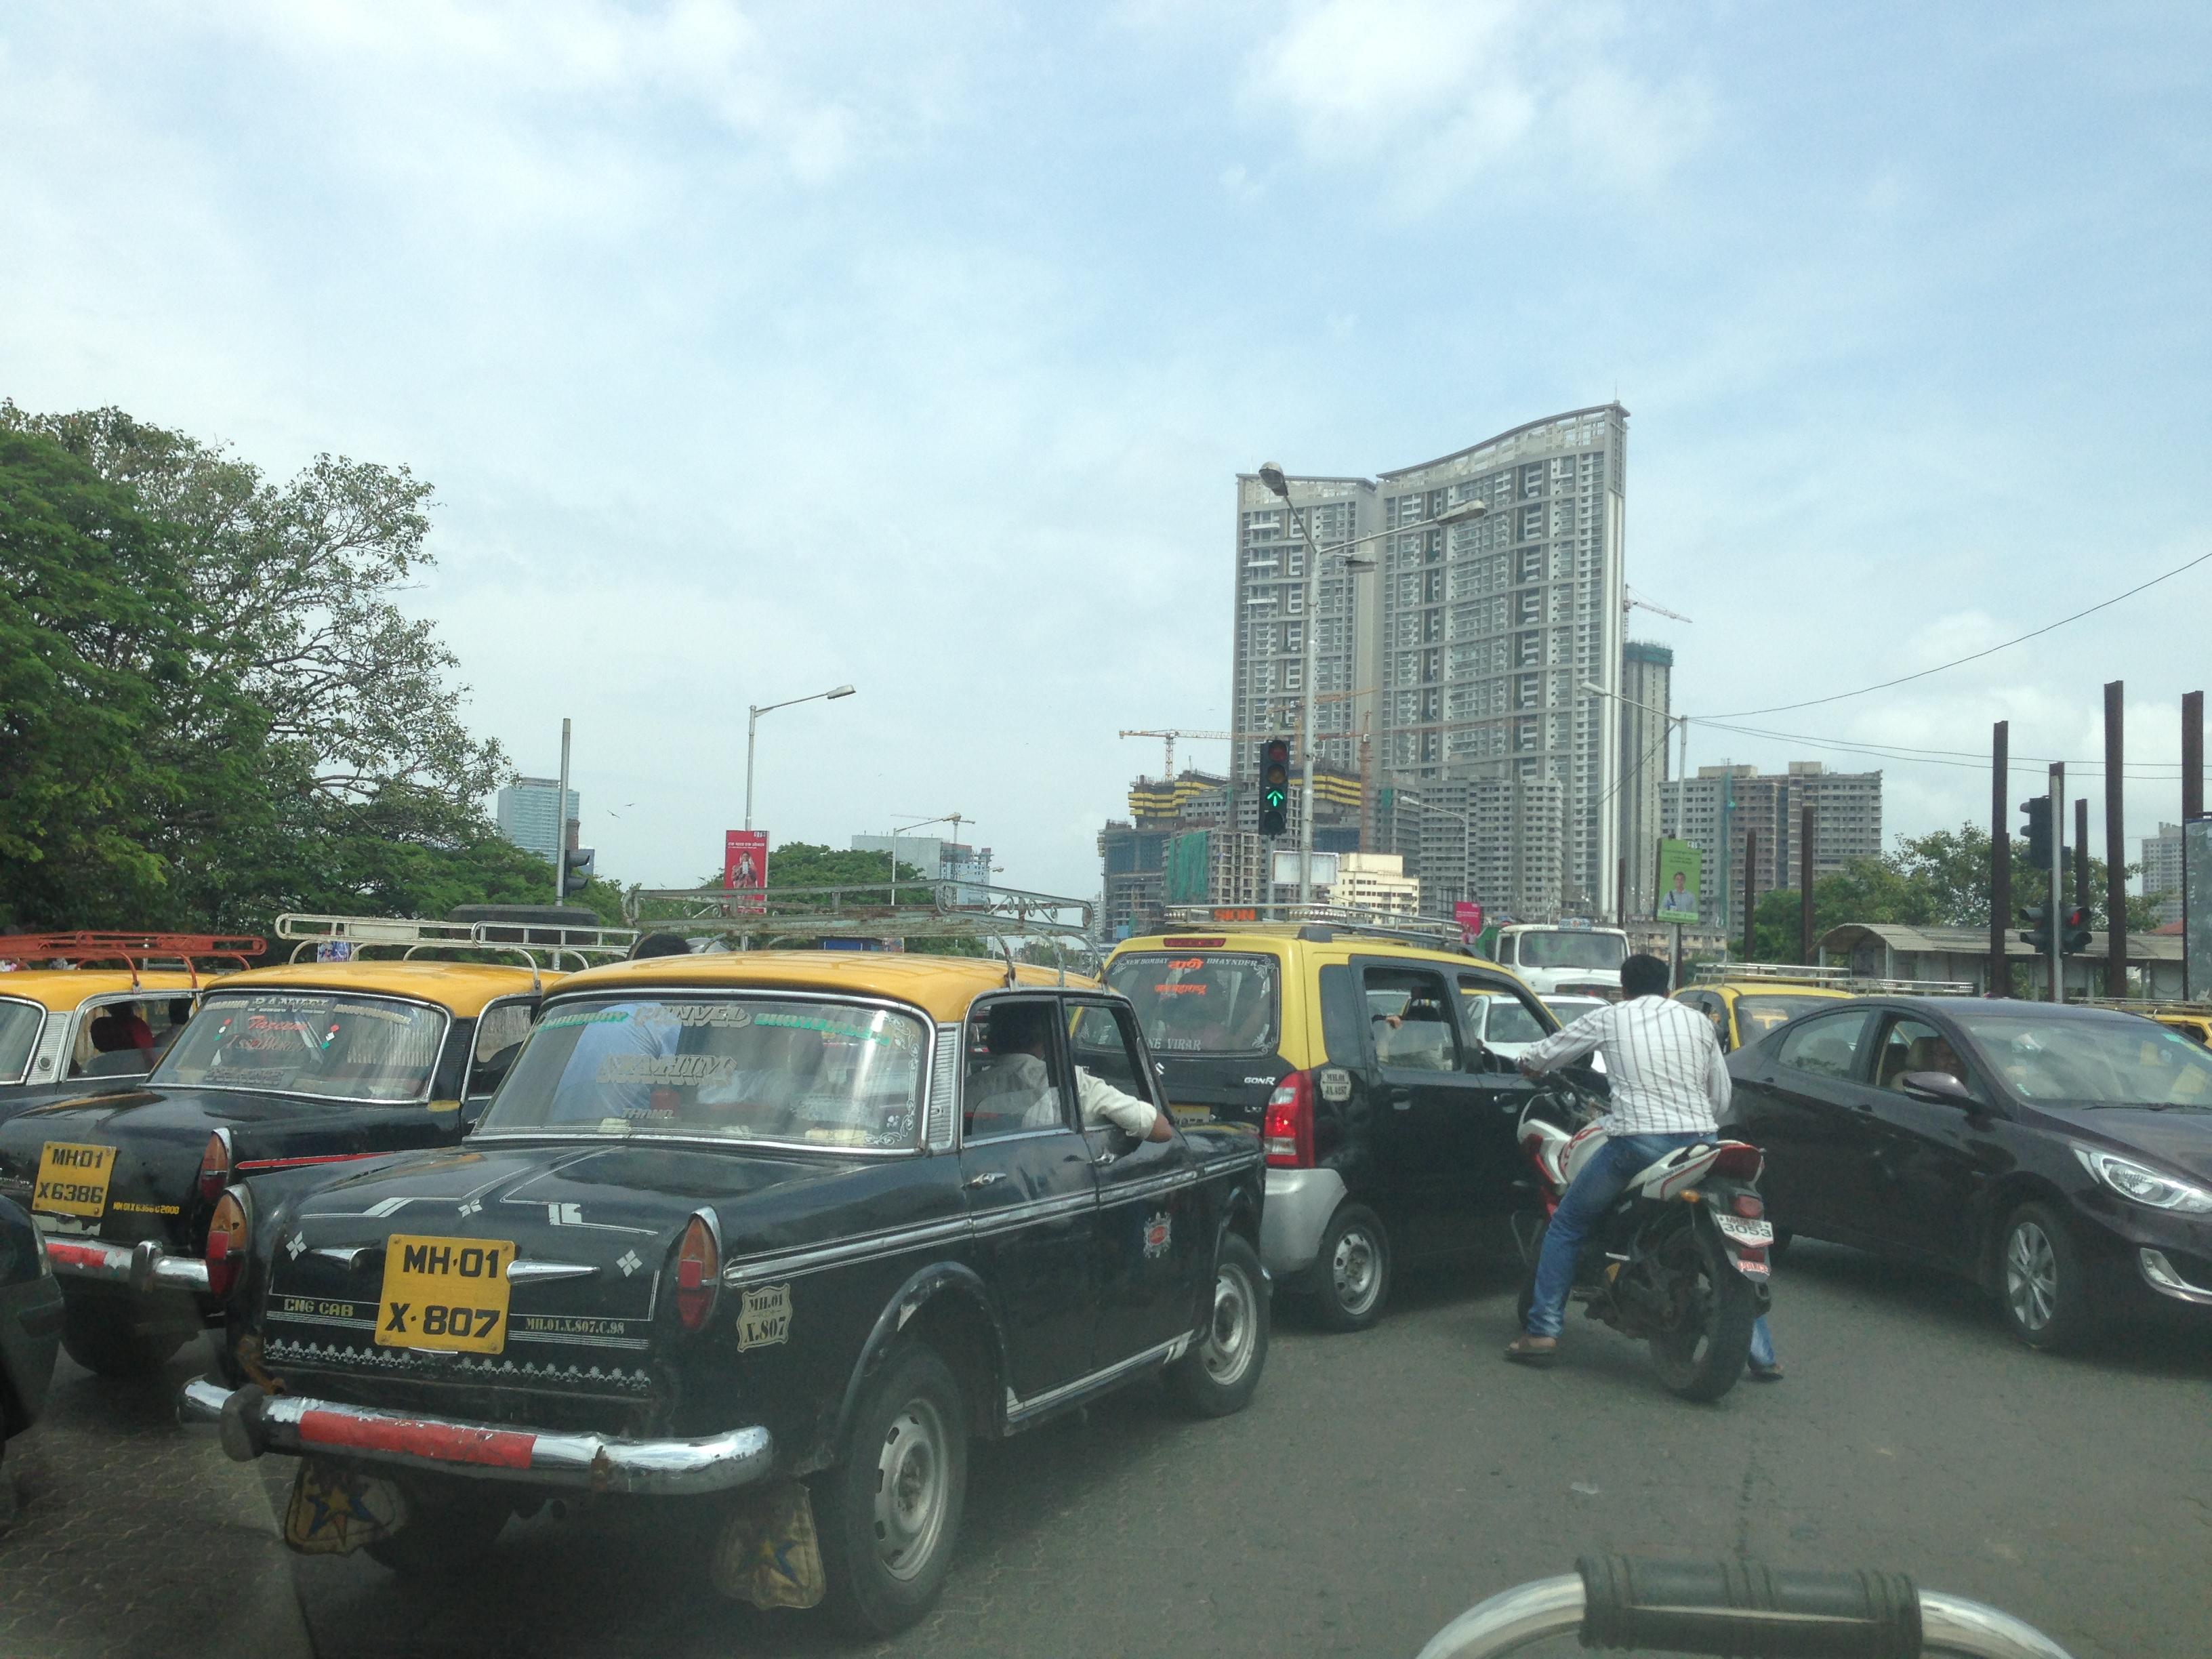 "<img src=http://""SMWMumbai_Mumbai_Traffic_Sep_2013.jpg""?w=272&h=204 alt=""SMWMumbai - Mumbai Traffic, Sep 2013"">"